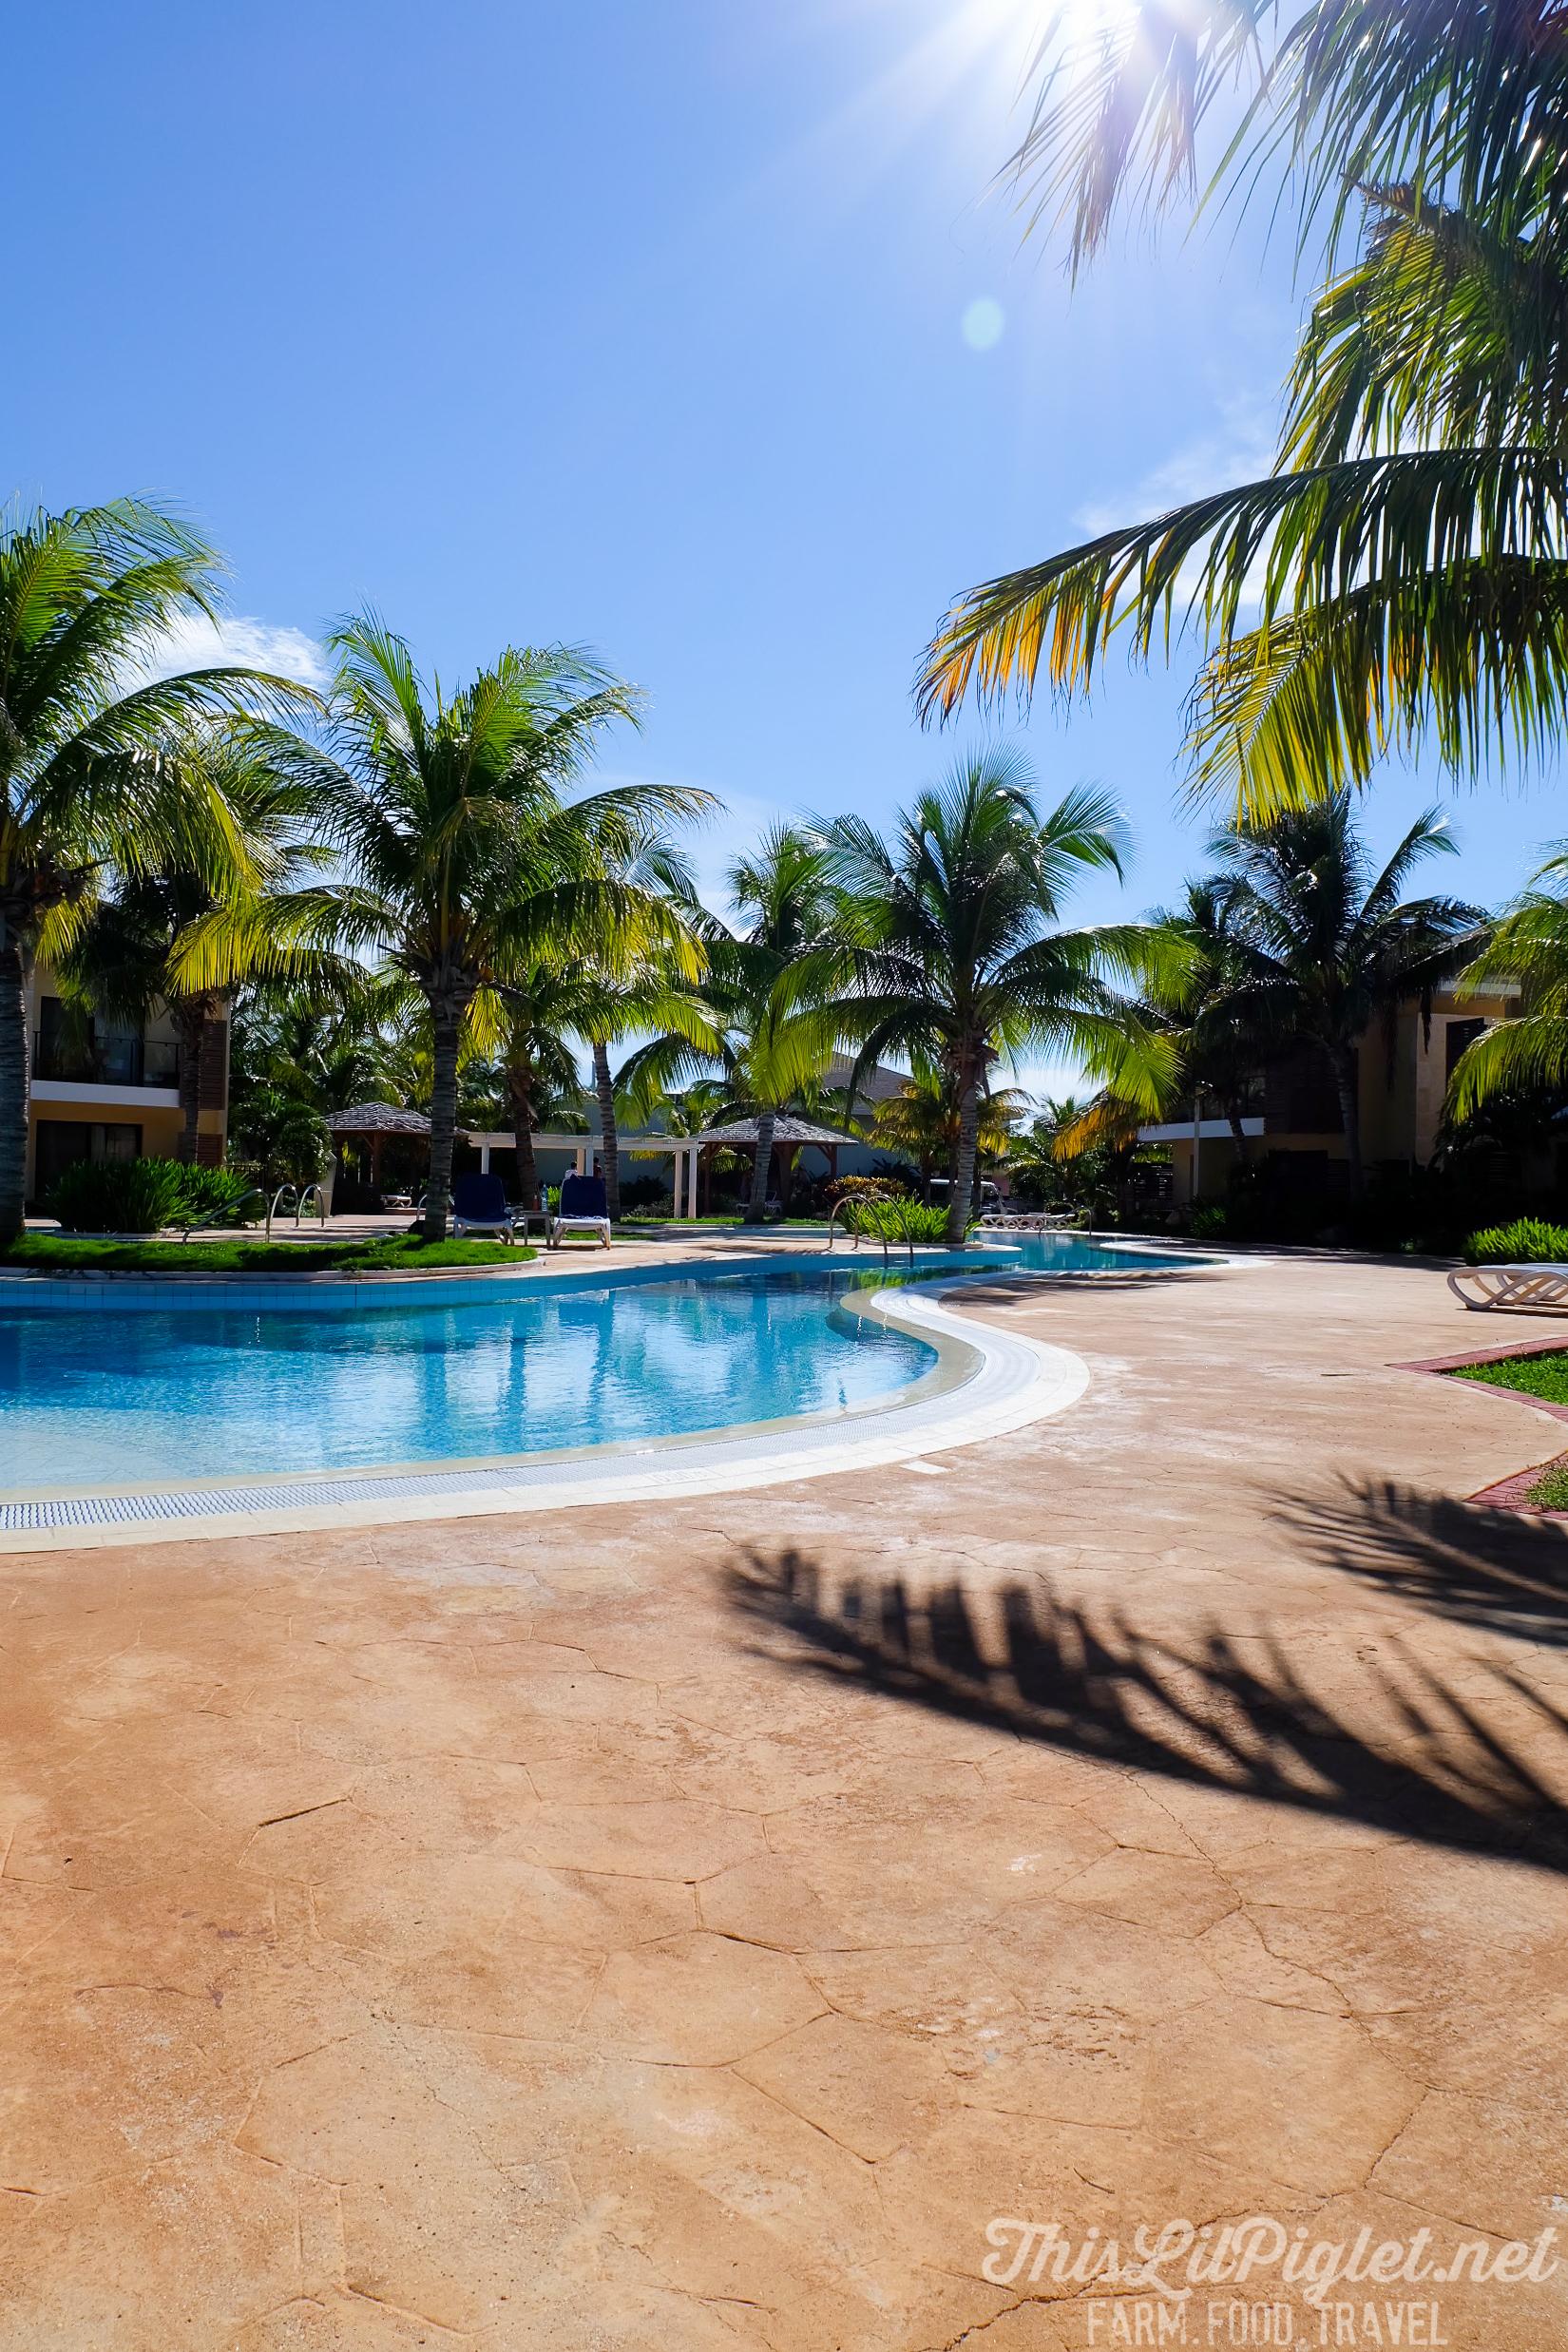 Cuba Couples Travel: Melia Buenavista Hotel Poolside // thislilpiglet.net